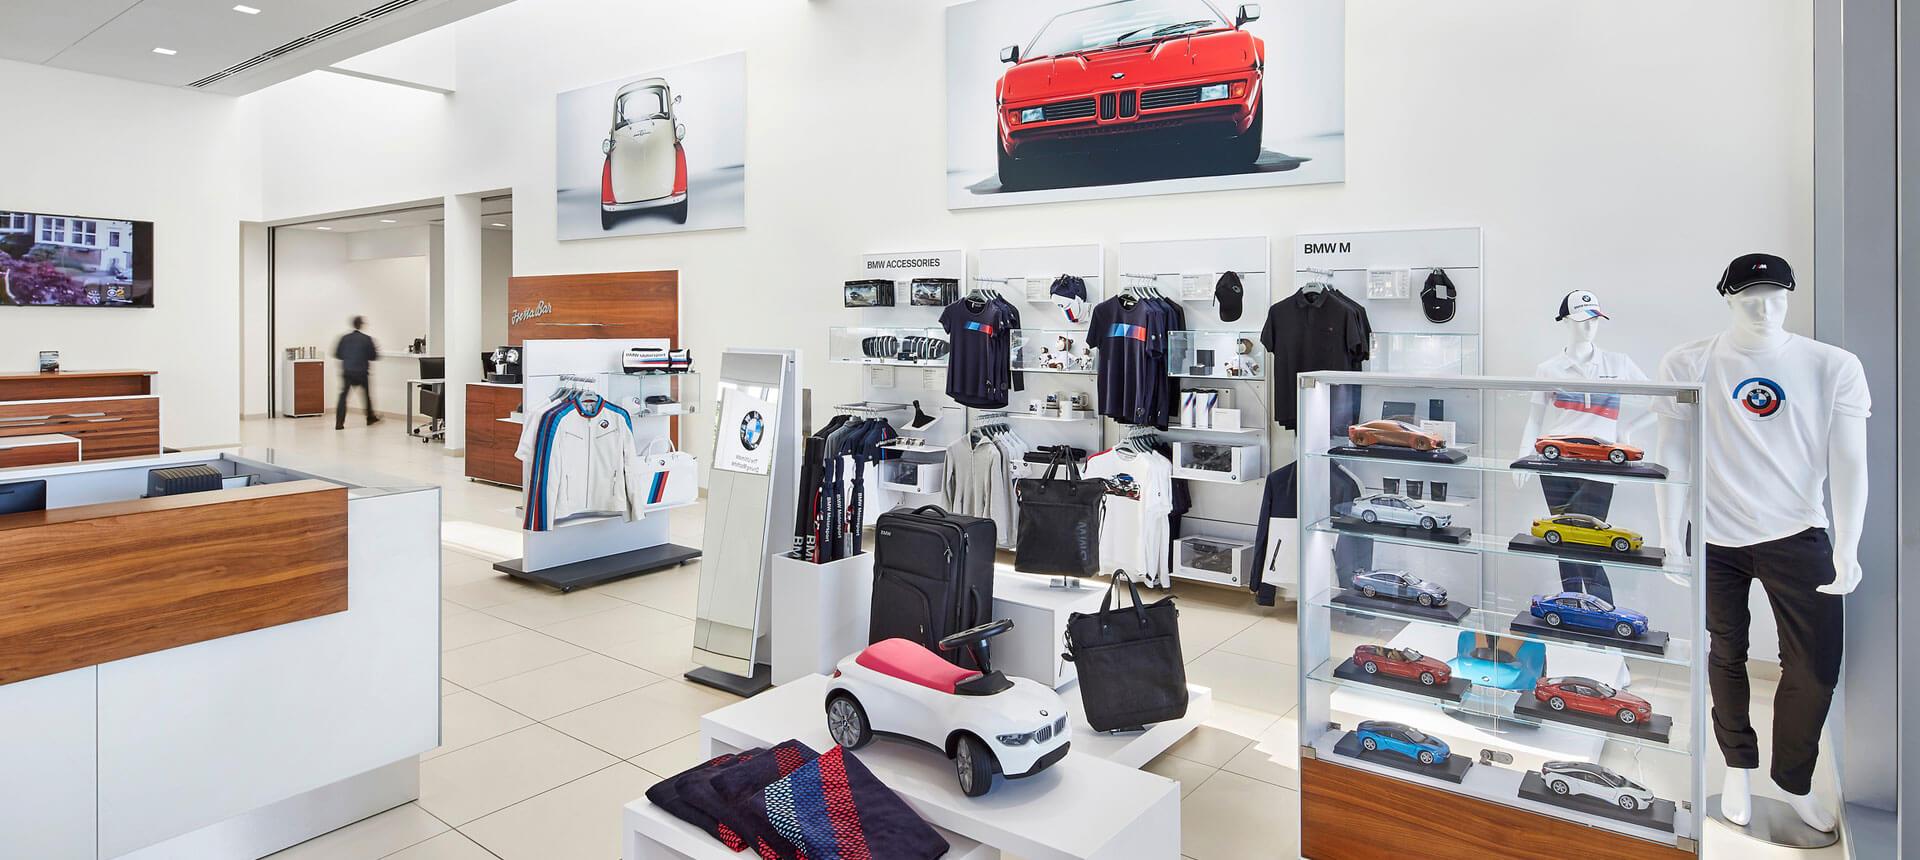 Habberstad BMW Huntington Station, New York Shop